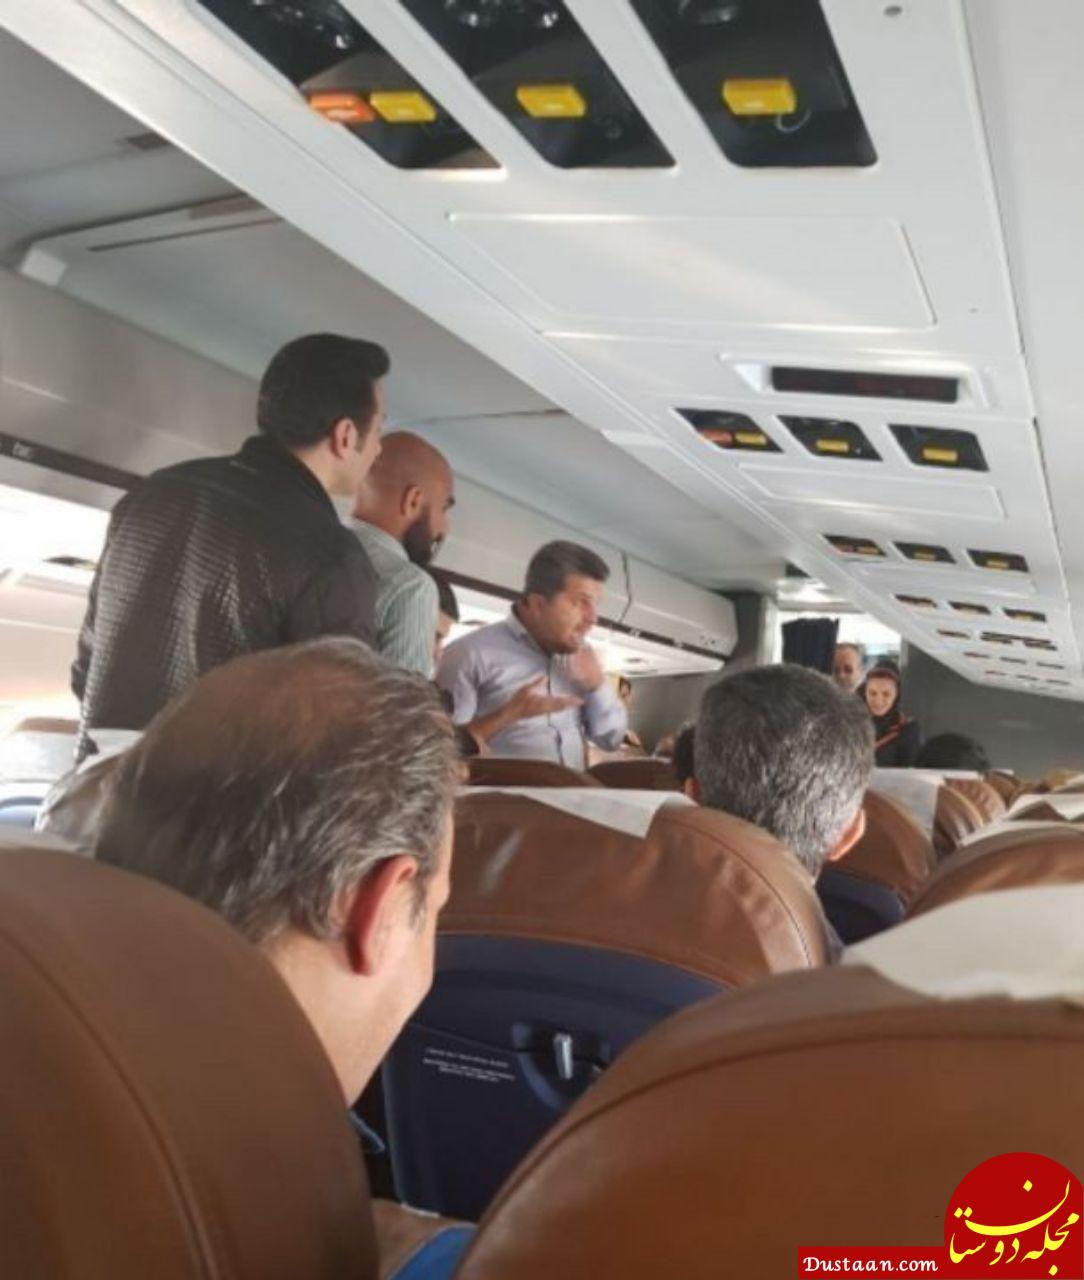 www.dustaan.com بازگشت پرواز تهران   اهواز به مهرآباد به دلیل نقص فنی +عکس